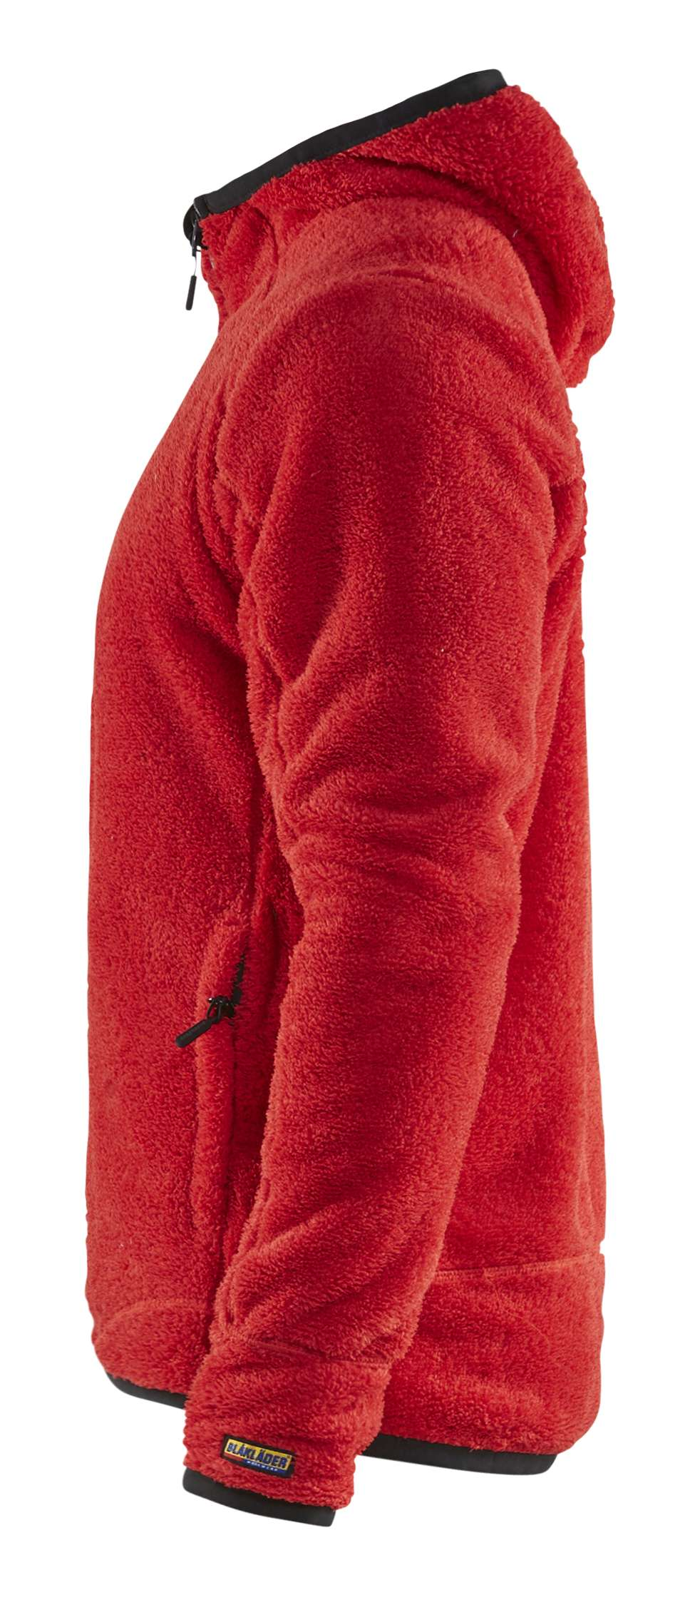 Blaklader Fleece vesten 48632502 rood(5600)